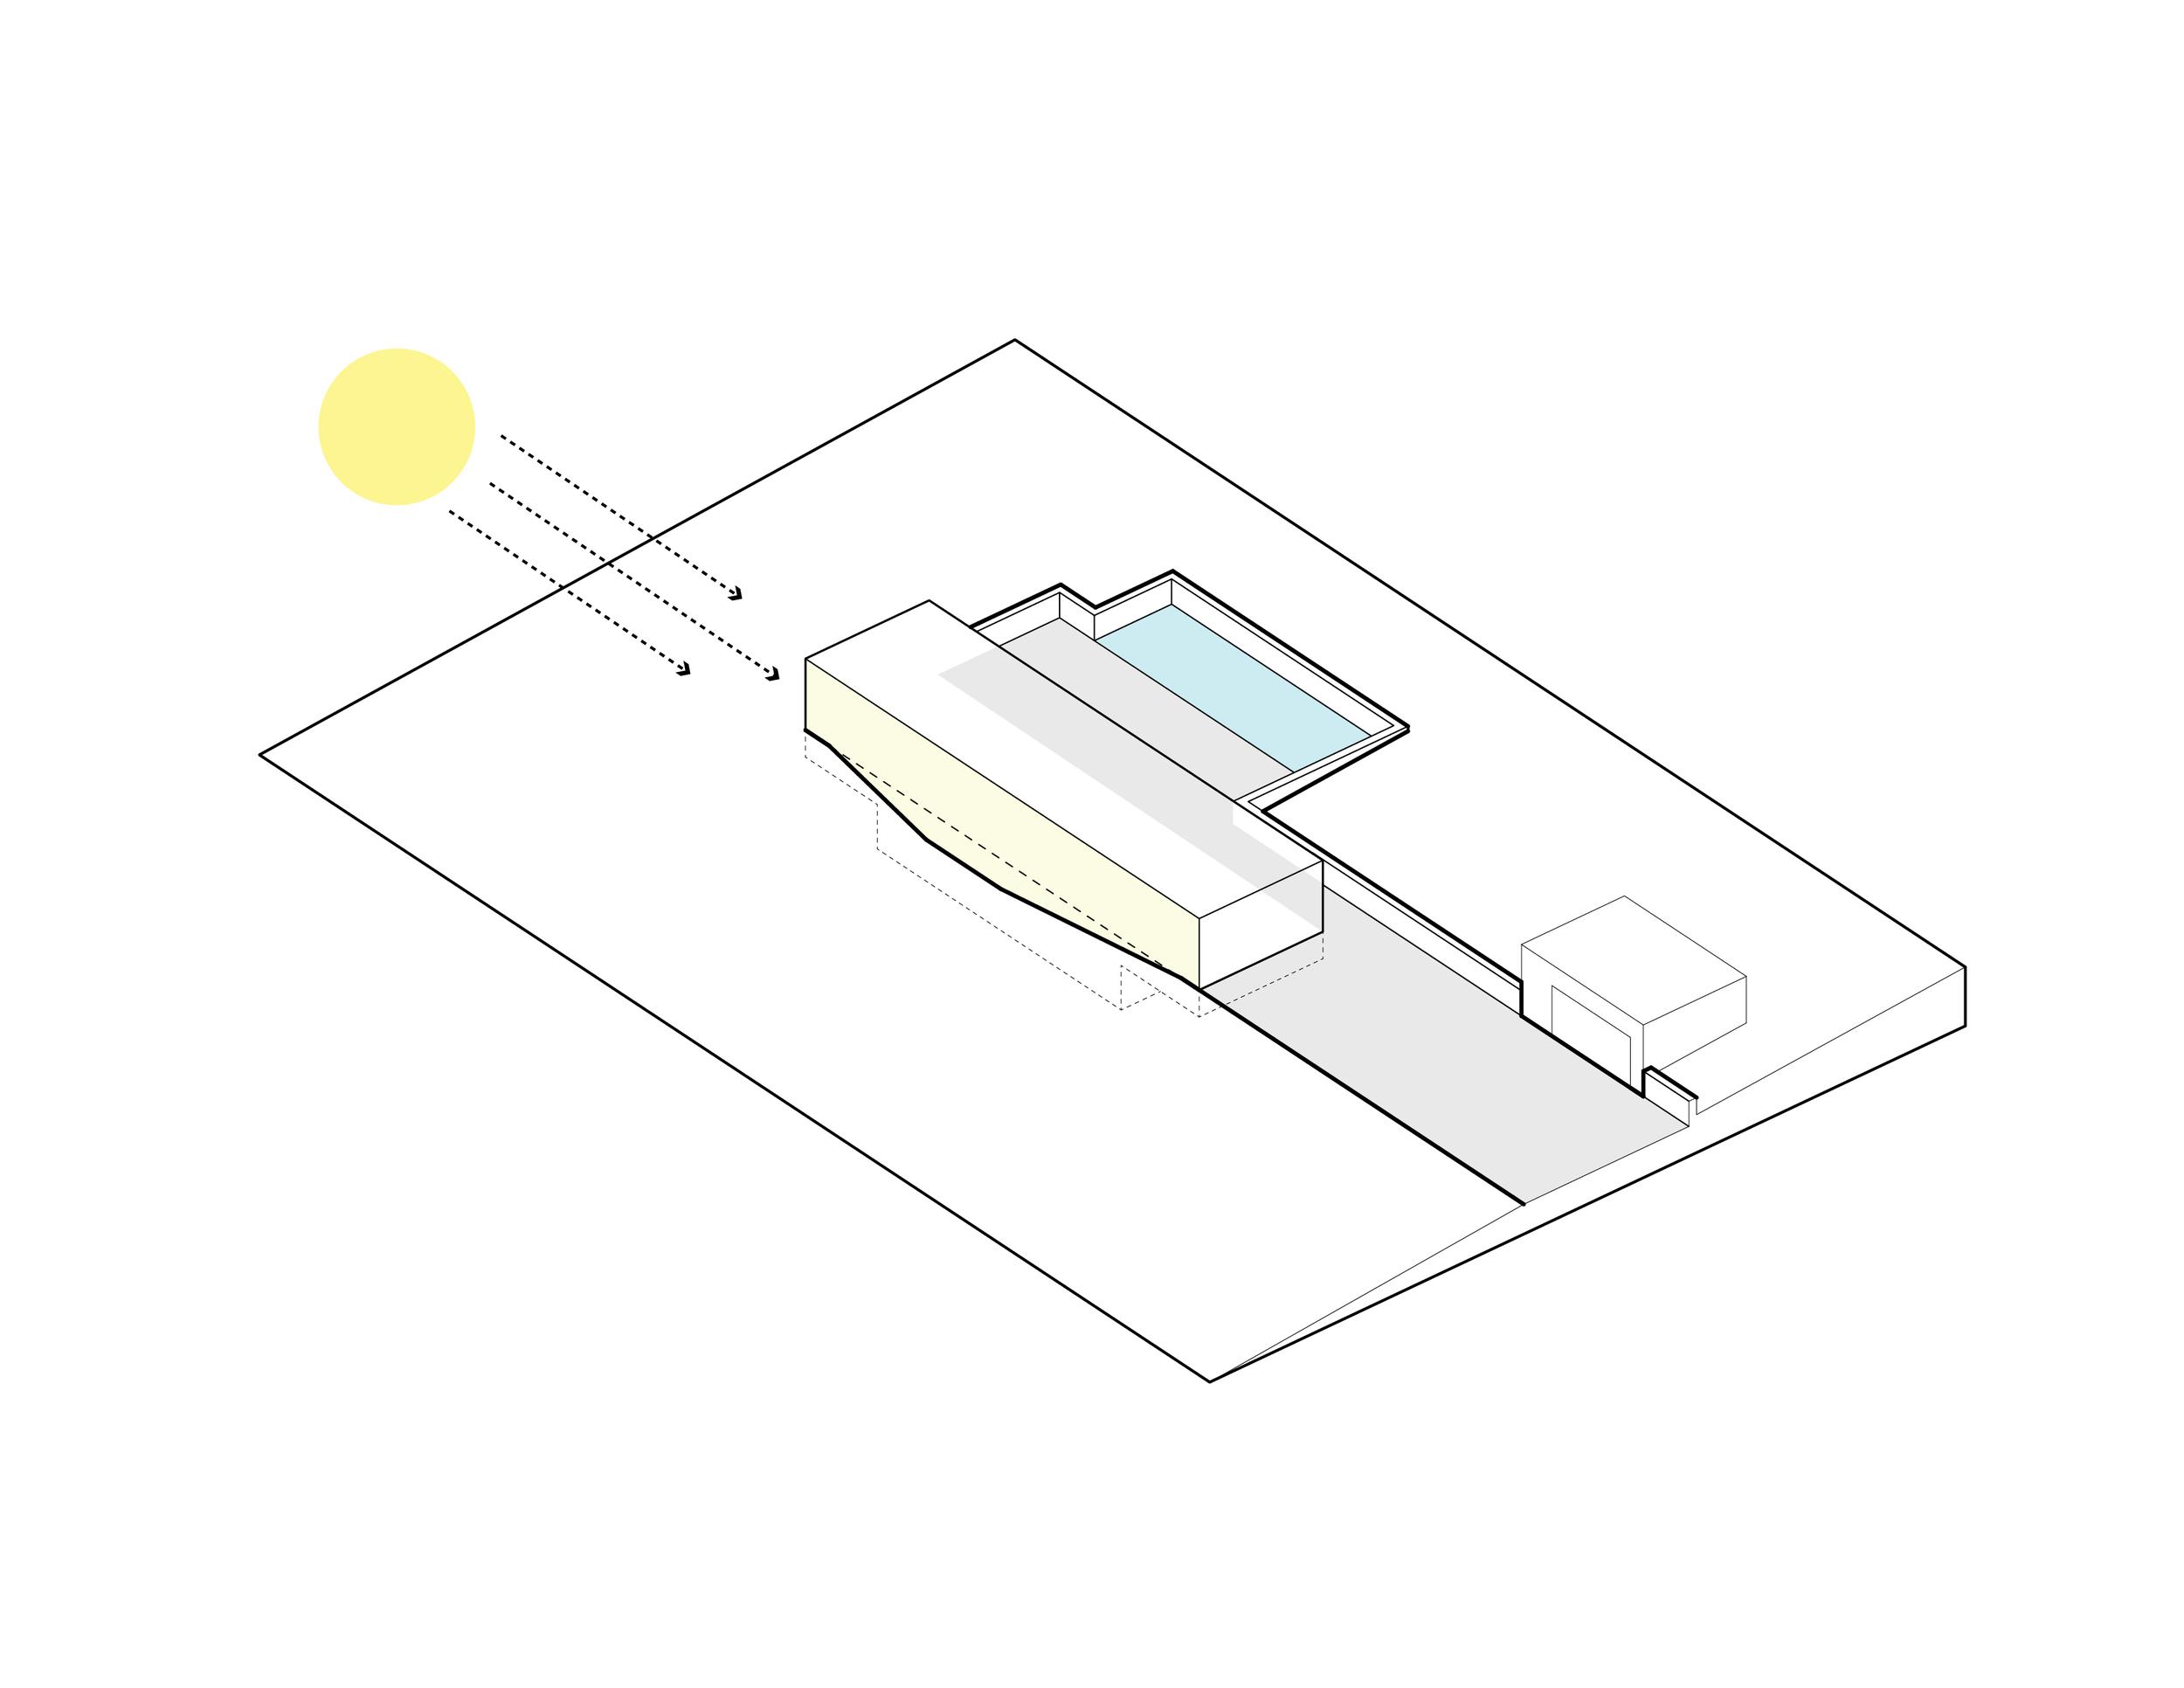 1407_05_Diagrams_SunSlope.jpg